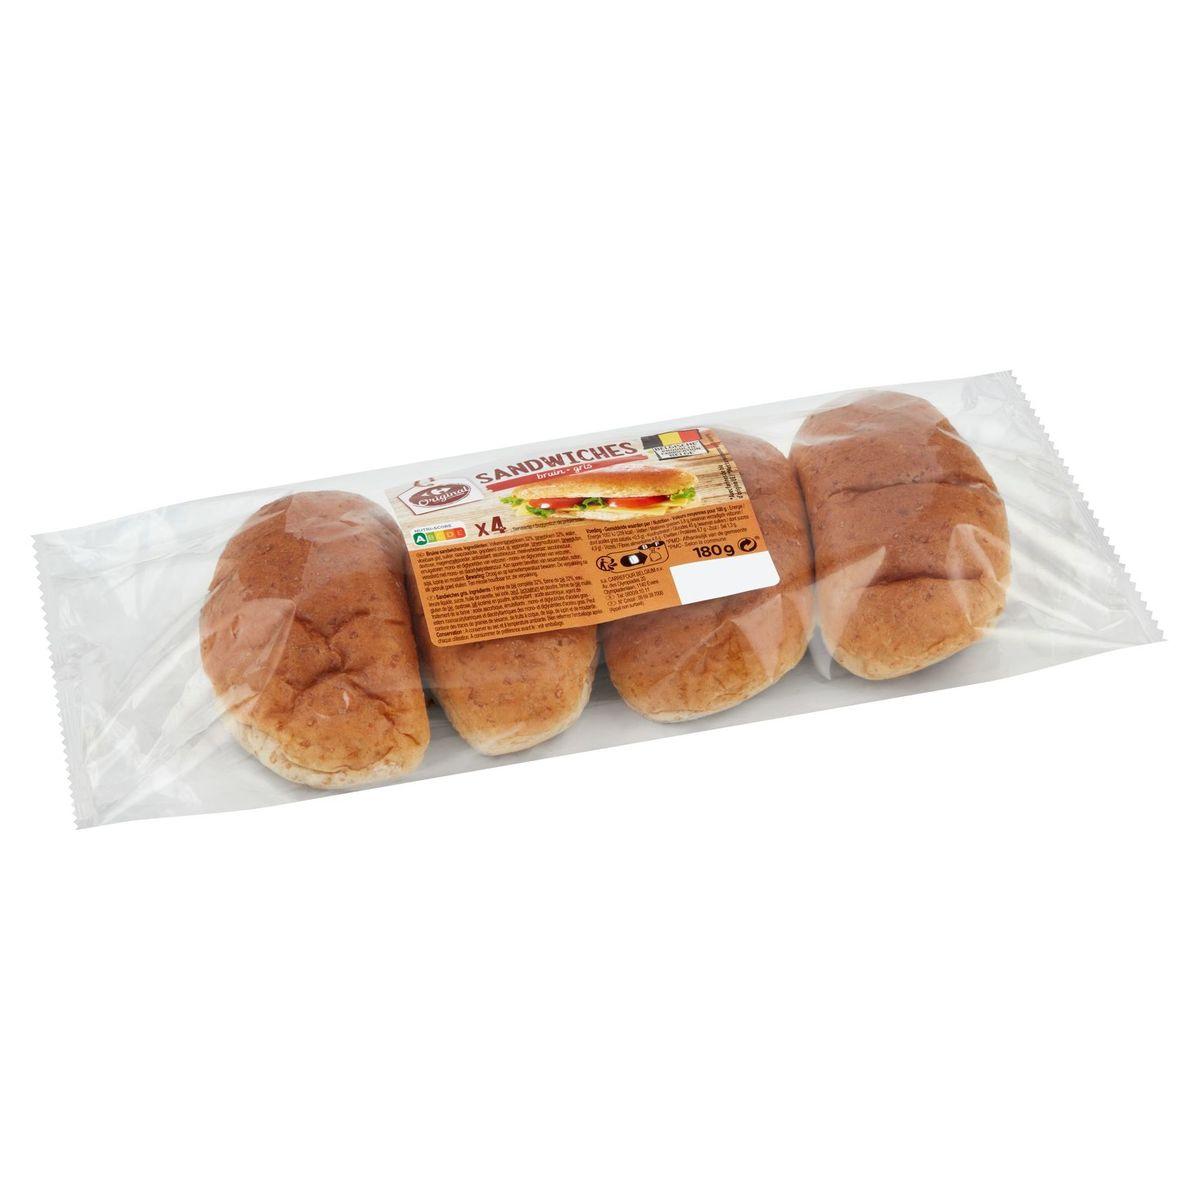 Carrefour Sandwiches Bruin 180 g